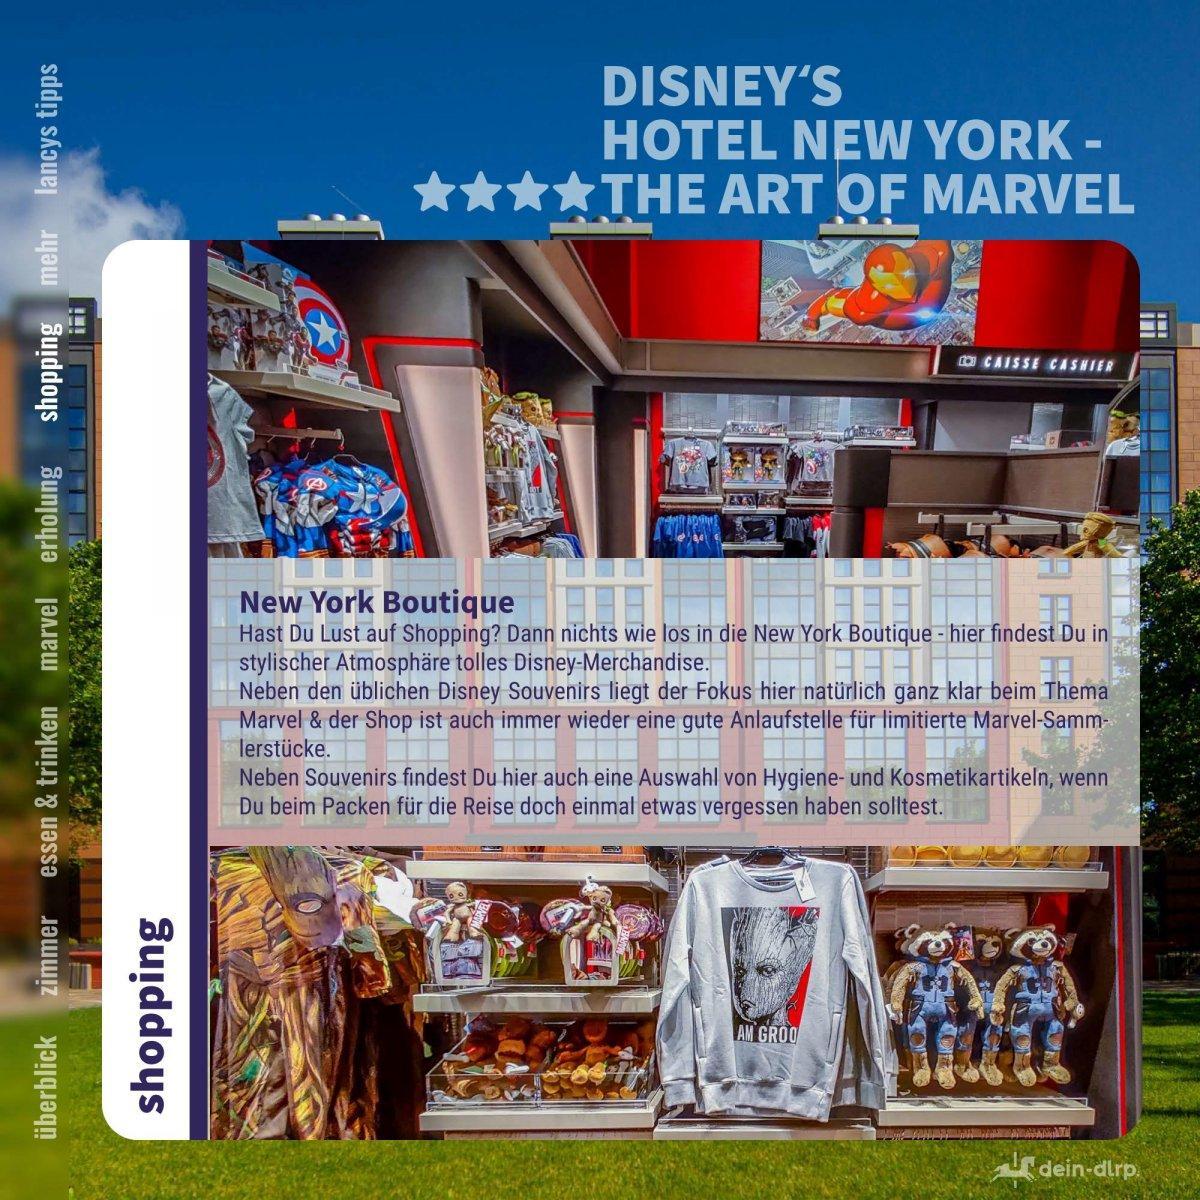 disneys-hotel-new-york-the-art-of-hotel-fuehrer_07.jpg